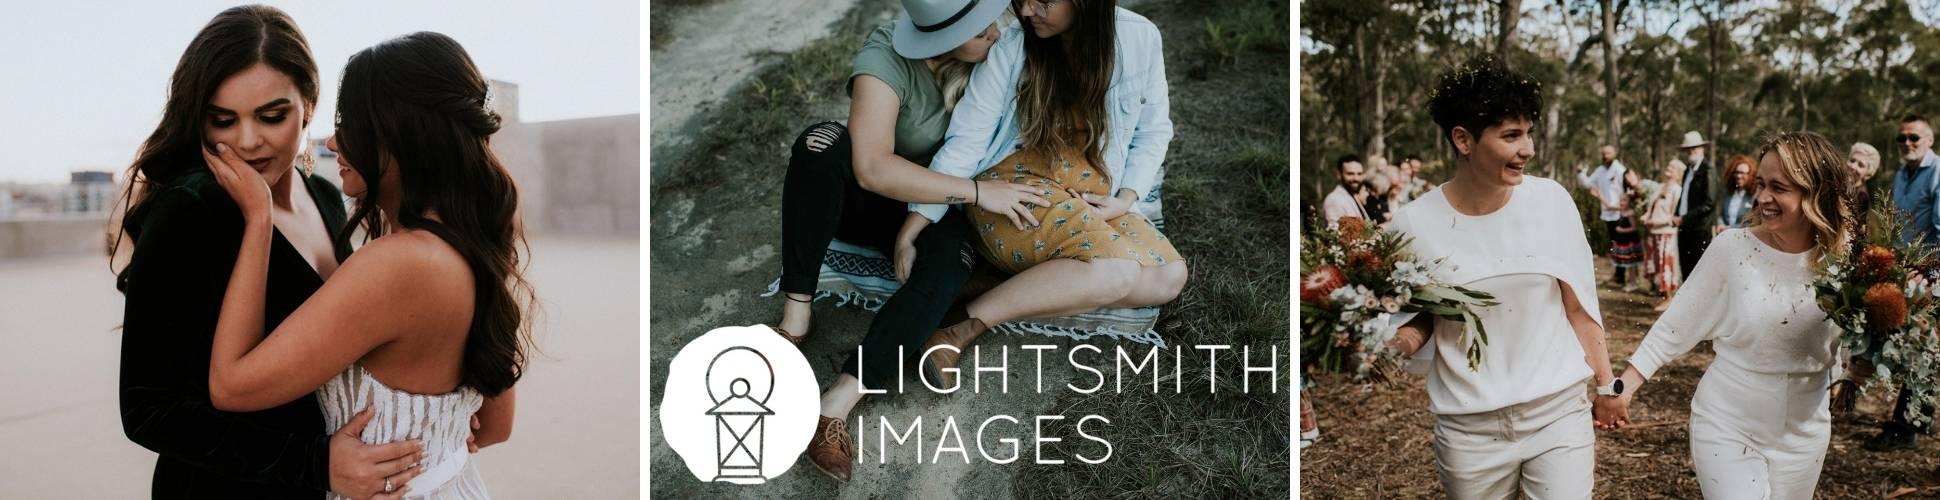 Lightsmith Images Brisbane Queensland same-sex lesbian gay wedding love engagement photography